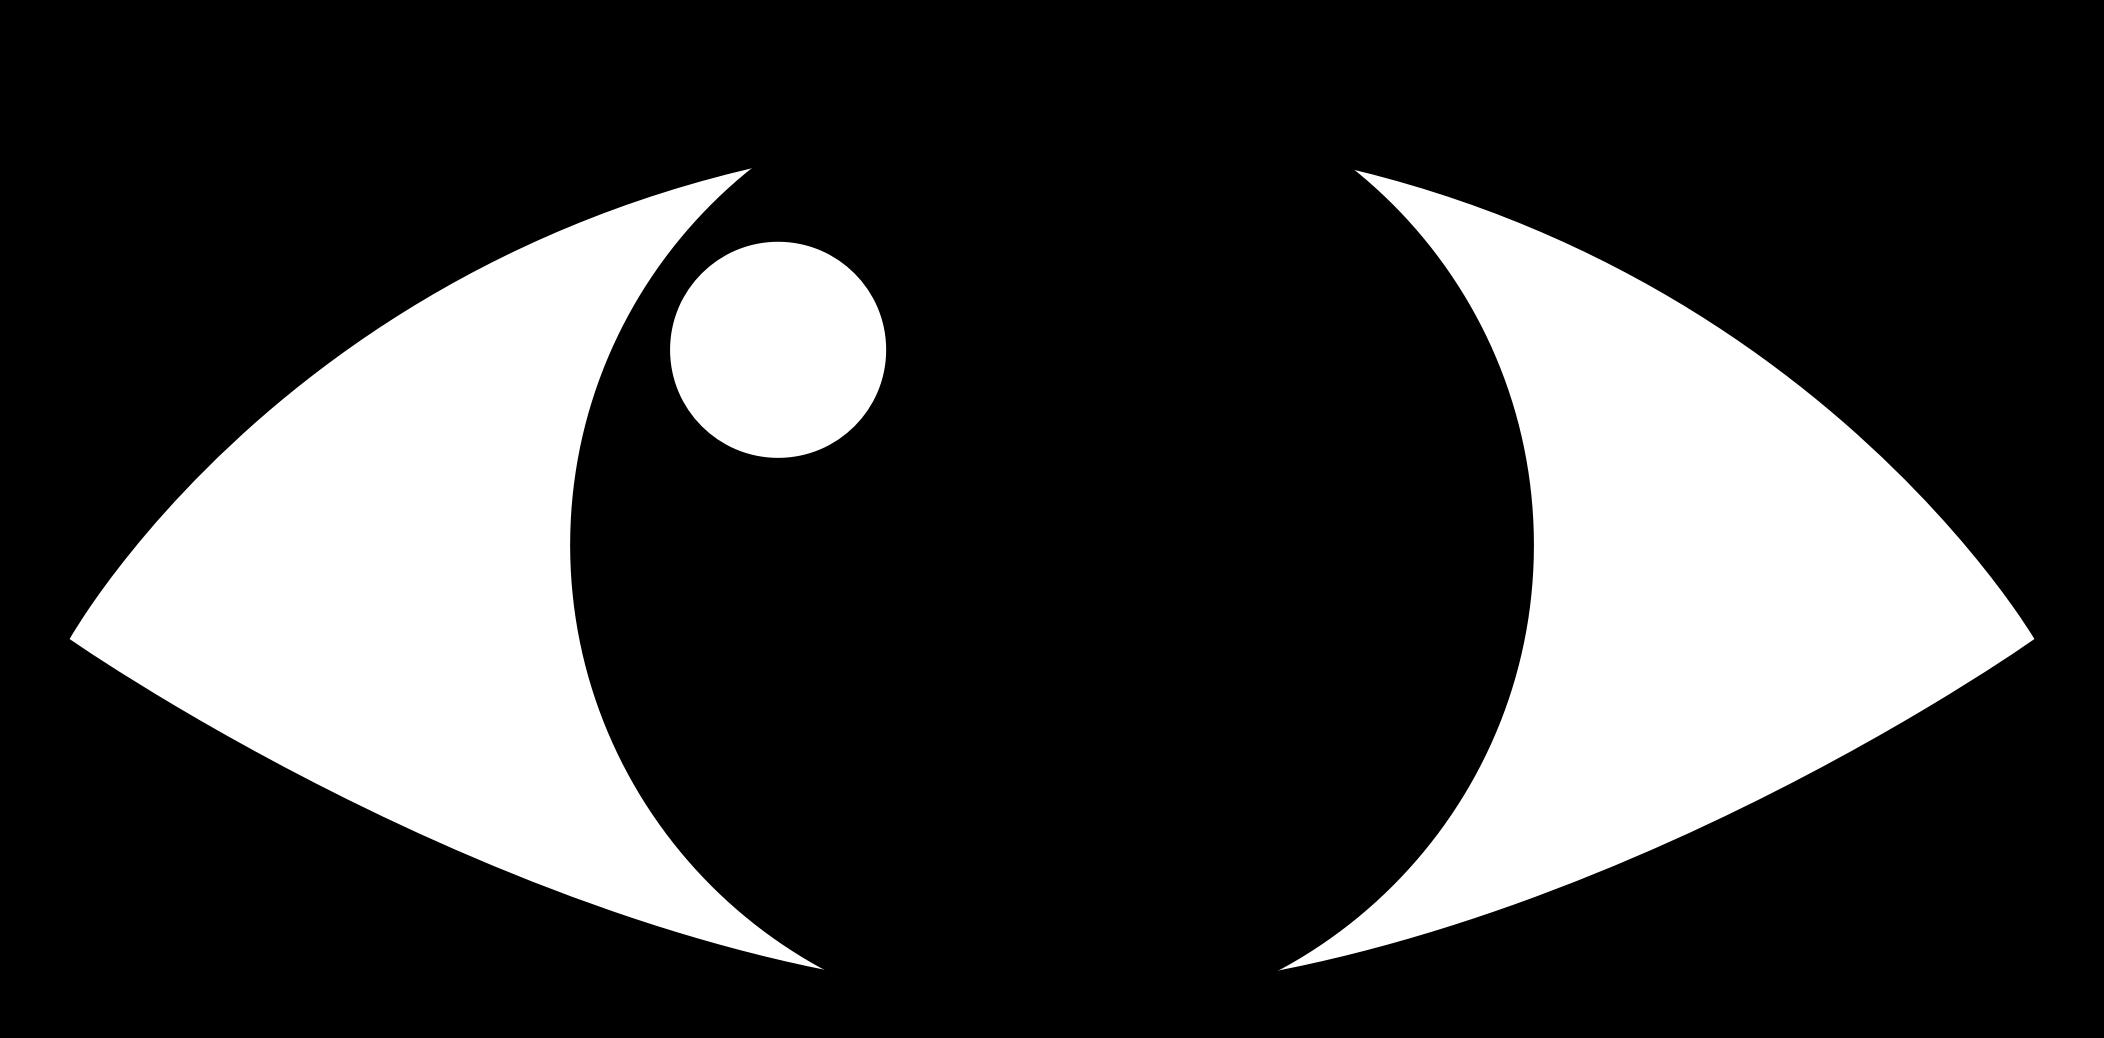 Halloween eyeball clipart png image freeuse Eyeball Cliparts - Cliparts Zone image freeuse